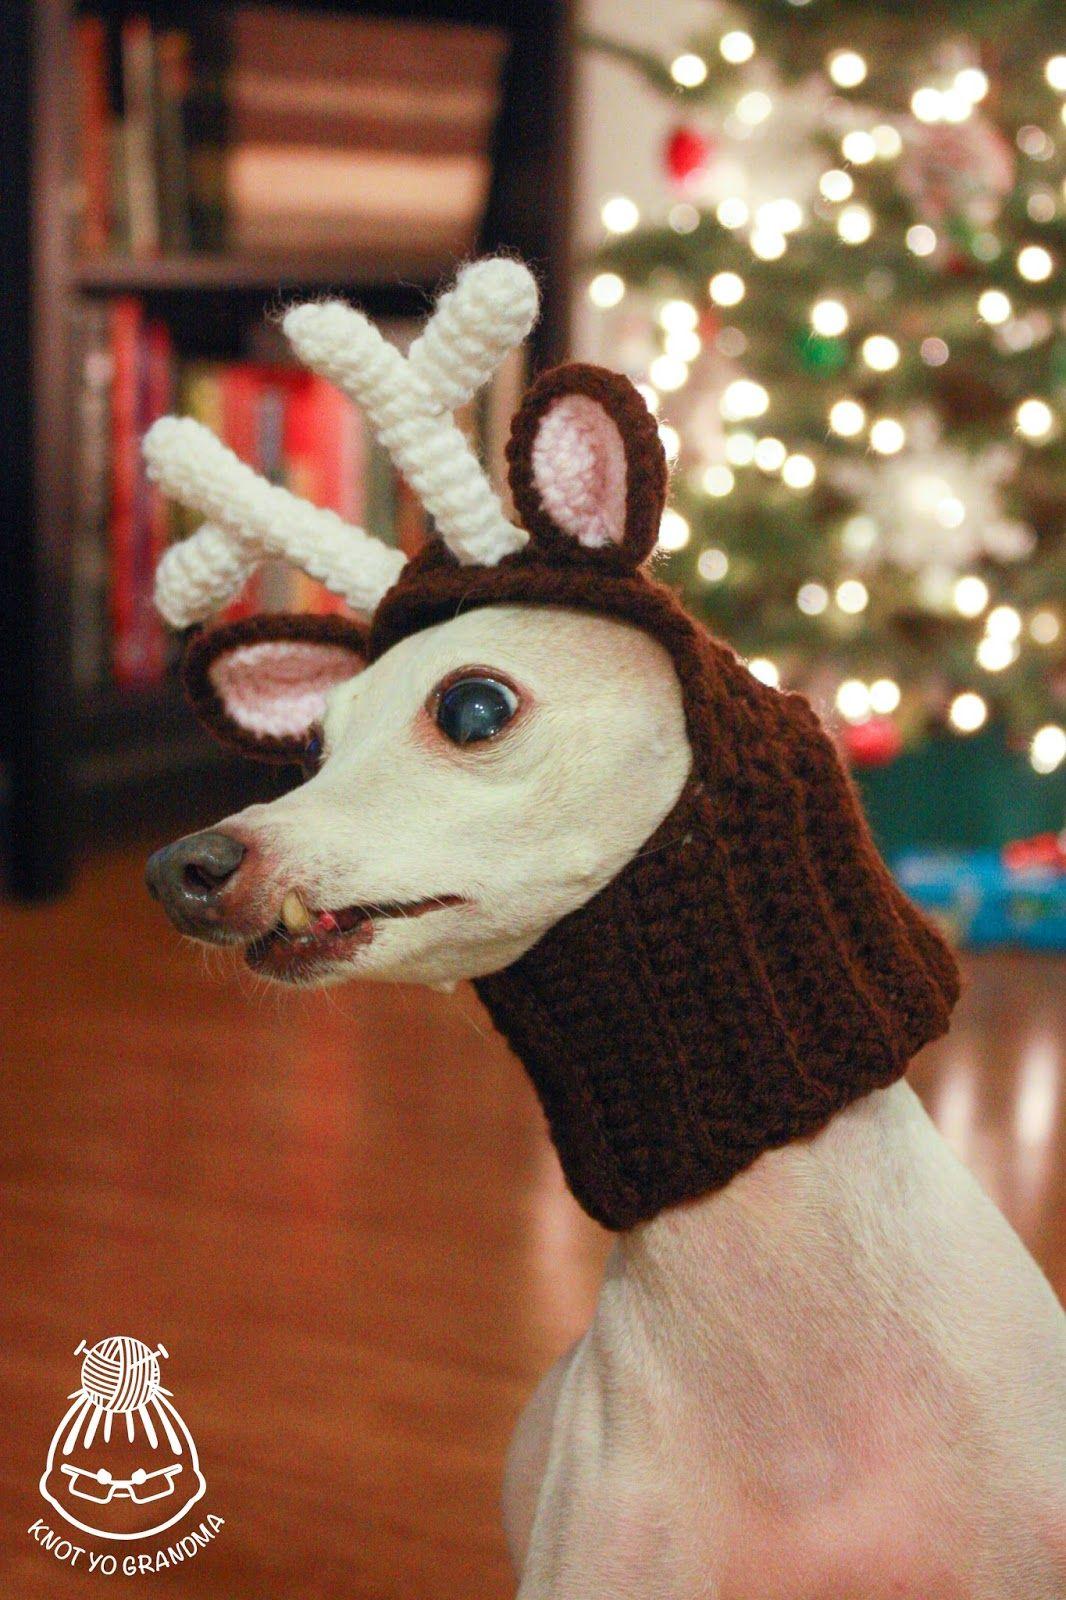 Knot Yo Grandma Diy Crocheted Reindeer Dog Headdress Crochet Dog Clothes Reindeer Dog Crochet Dog Sweater